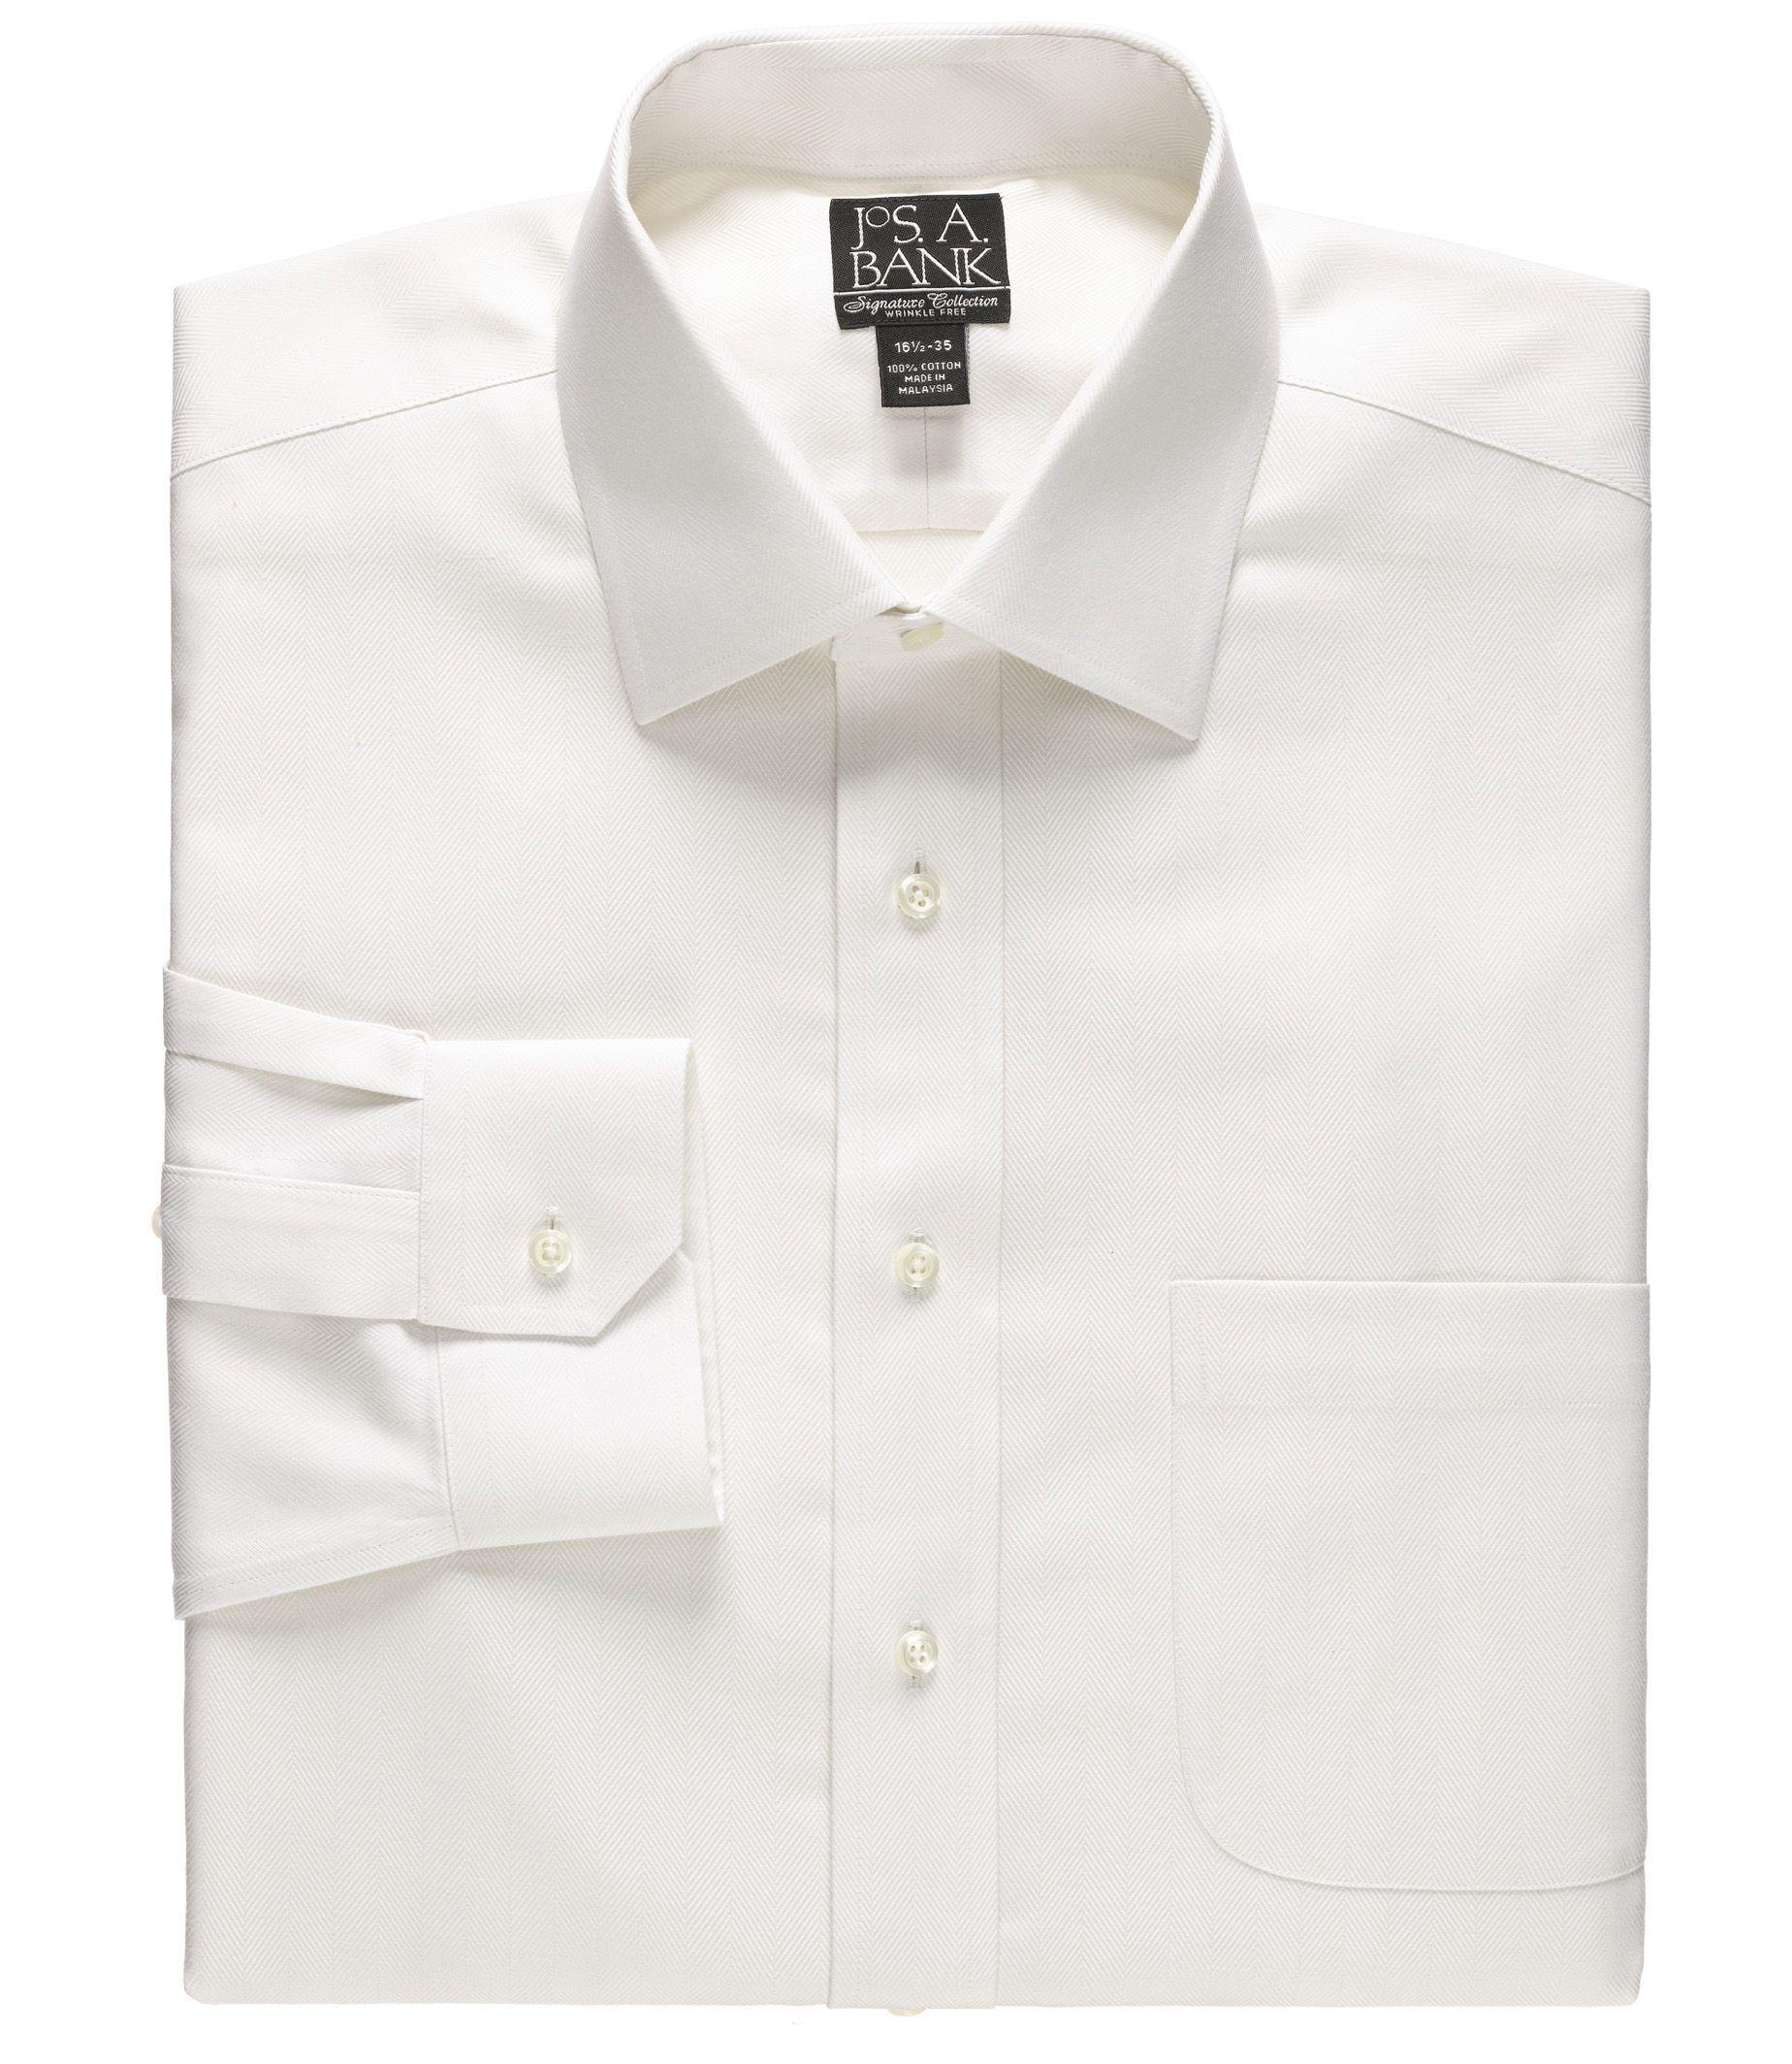 Men 39 s short sleeve tailored fit dress shirts ivo hoogveld for Tailored fit dress shirts